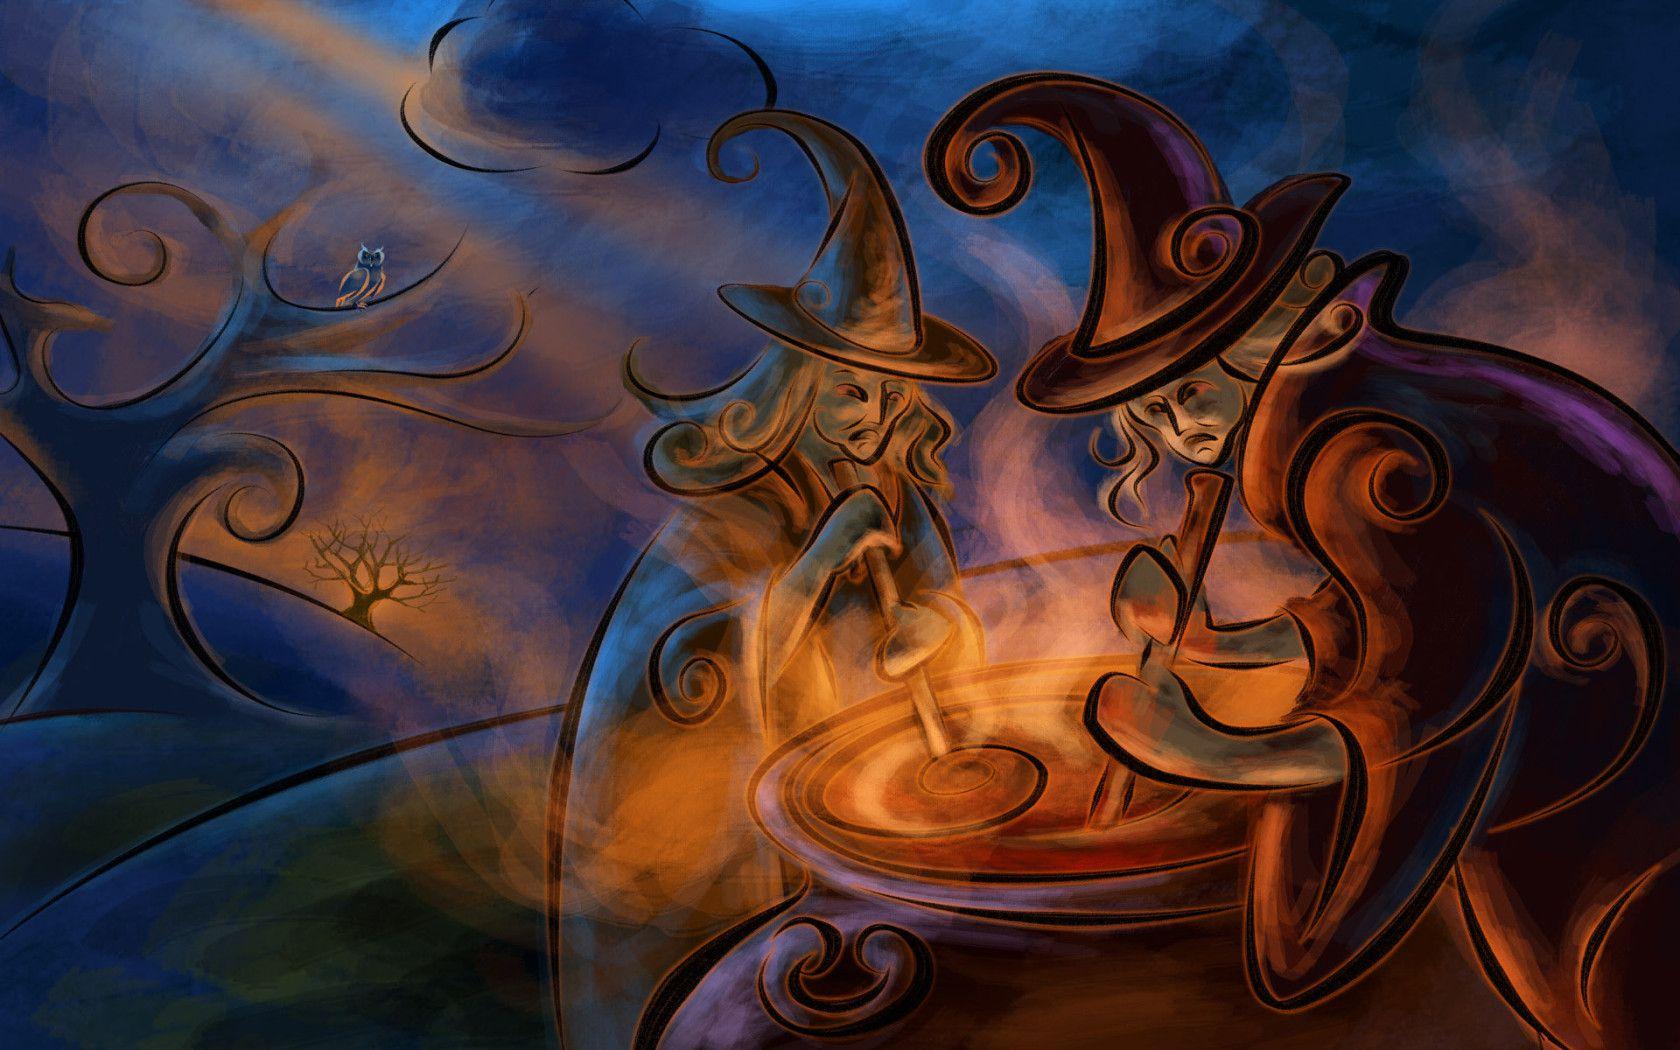 free halloween witchcraft pictures 86160 - Halloween Witchcraft